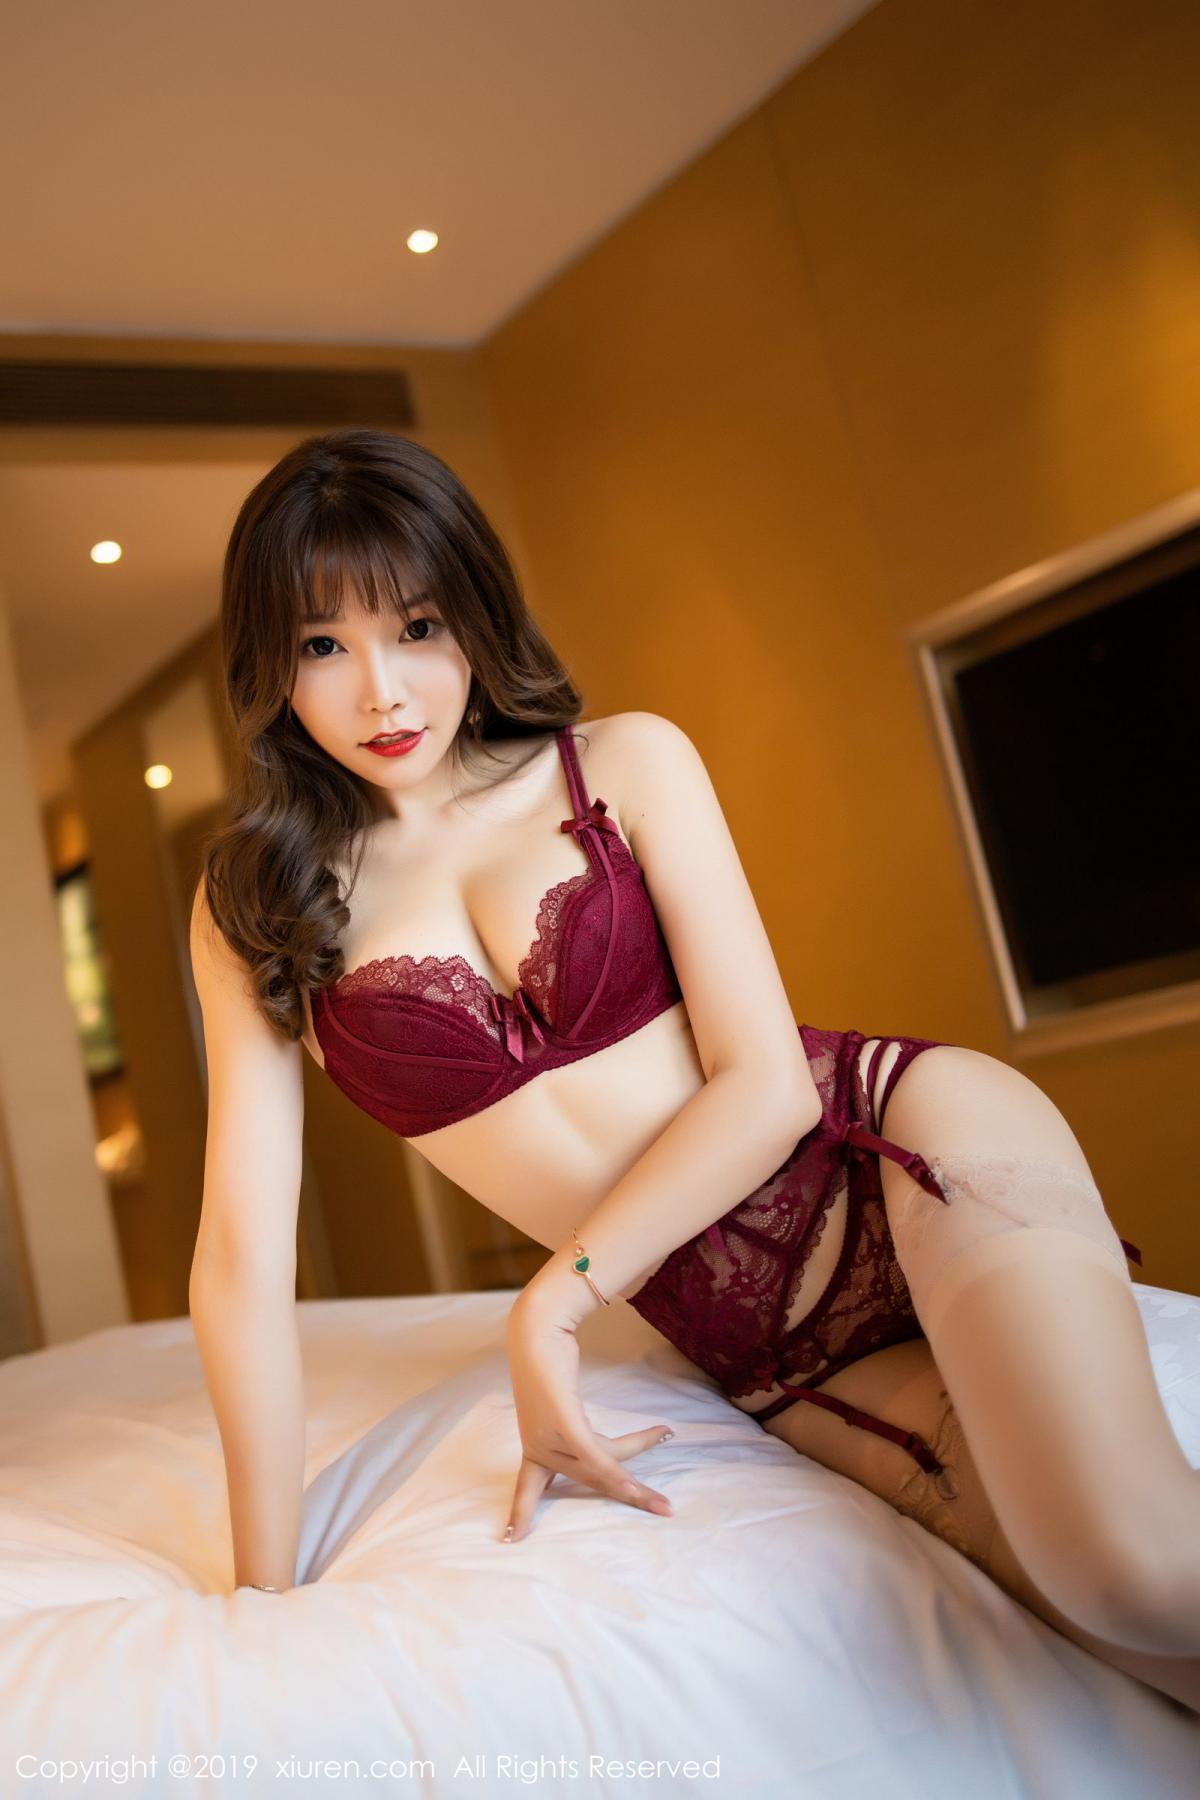 [XiuRen] Vol.1683 Chen Zhi 30P, Chen Zhi, Tall, Underwear, Xiuren